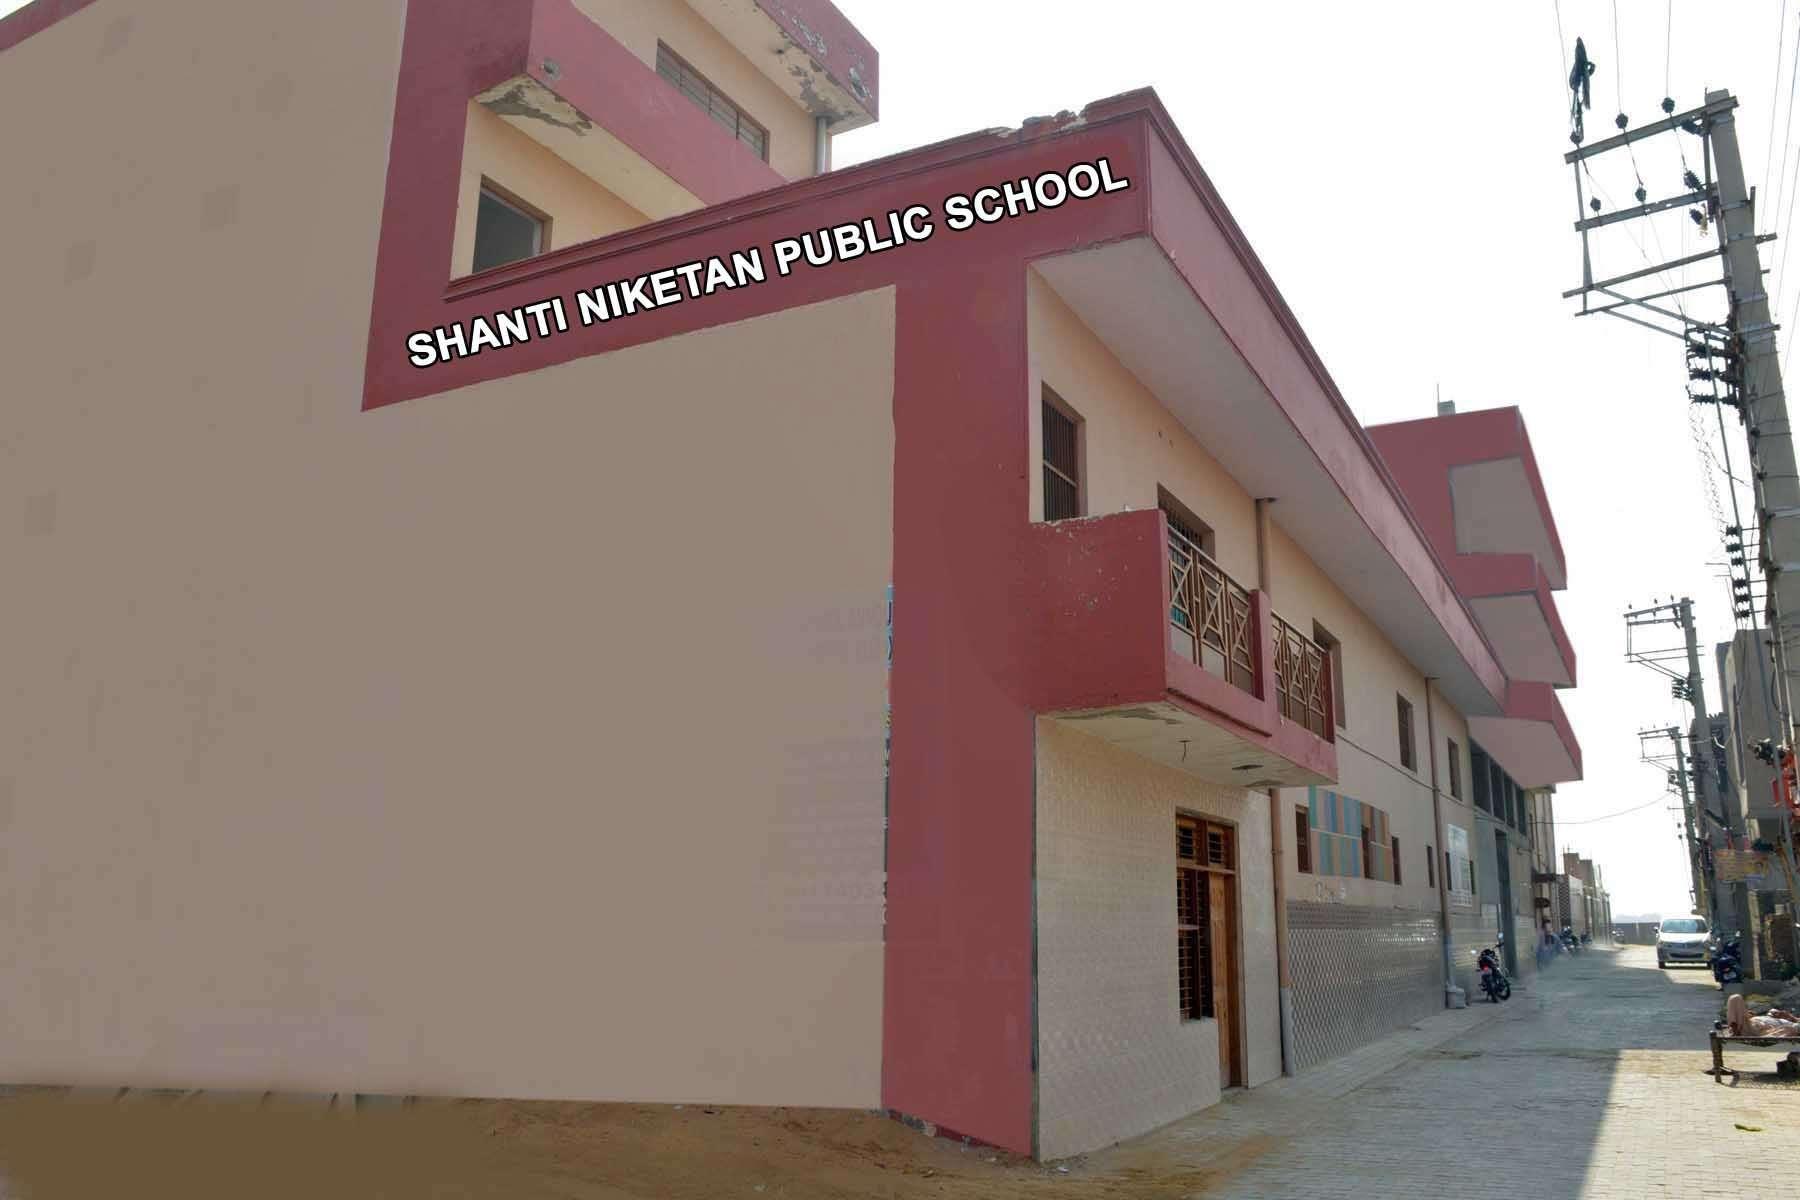 SHANTI NIKETAN PUBLIC SCHOOL TEK CHAND NAGAR GURGAON HARYANA 530527